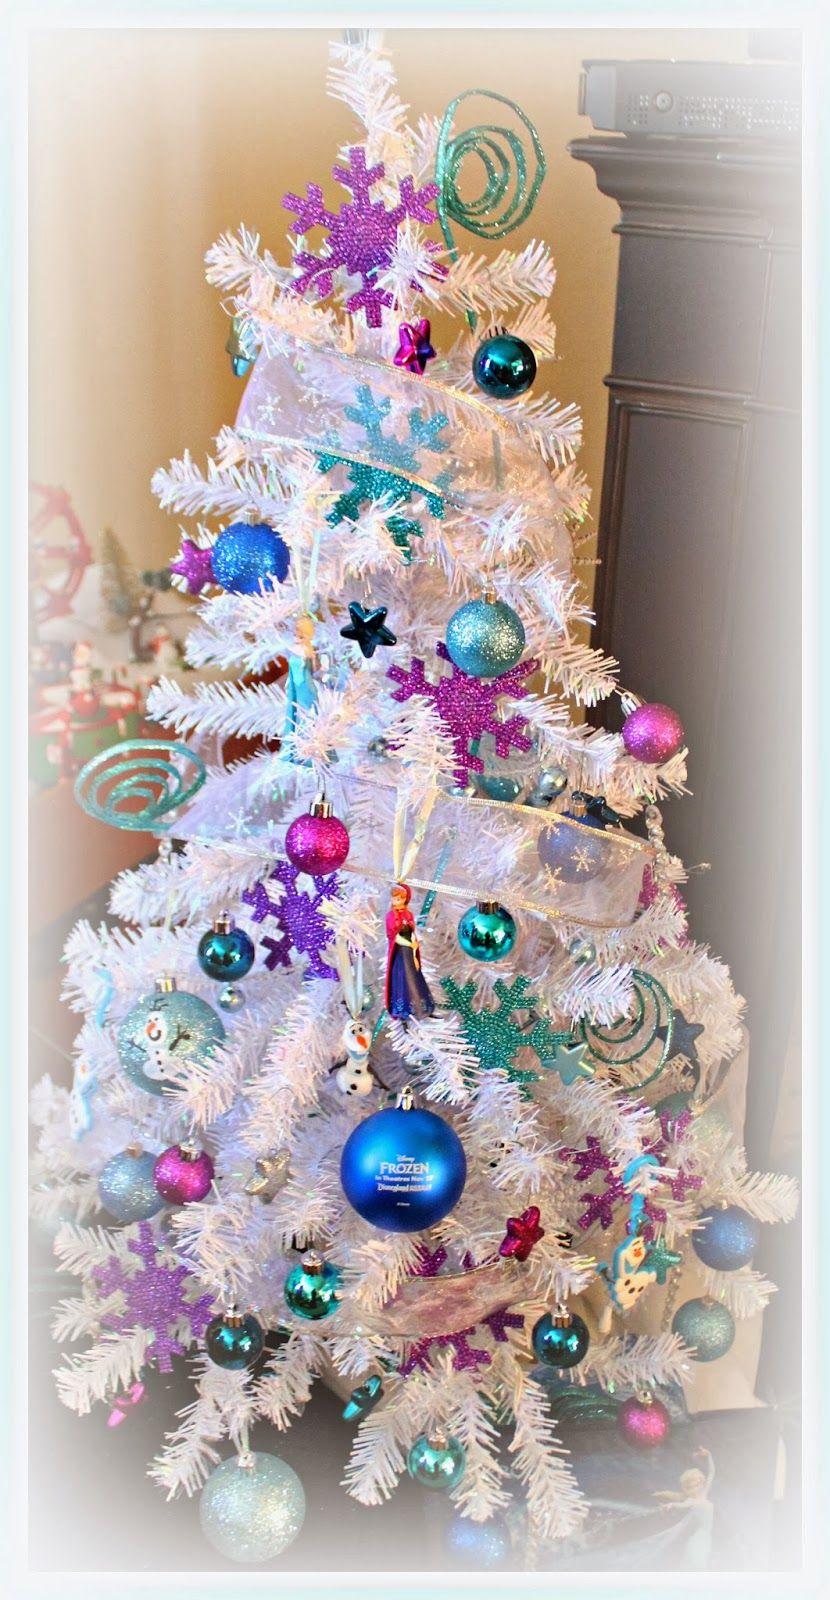 Frozen Christmas Decorations.Disney Frozen Christmas Tree Diy Olaf Ornament Disney S